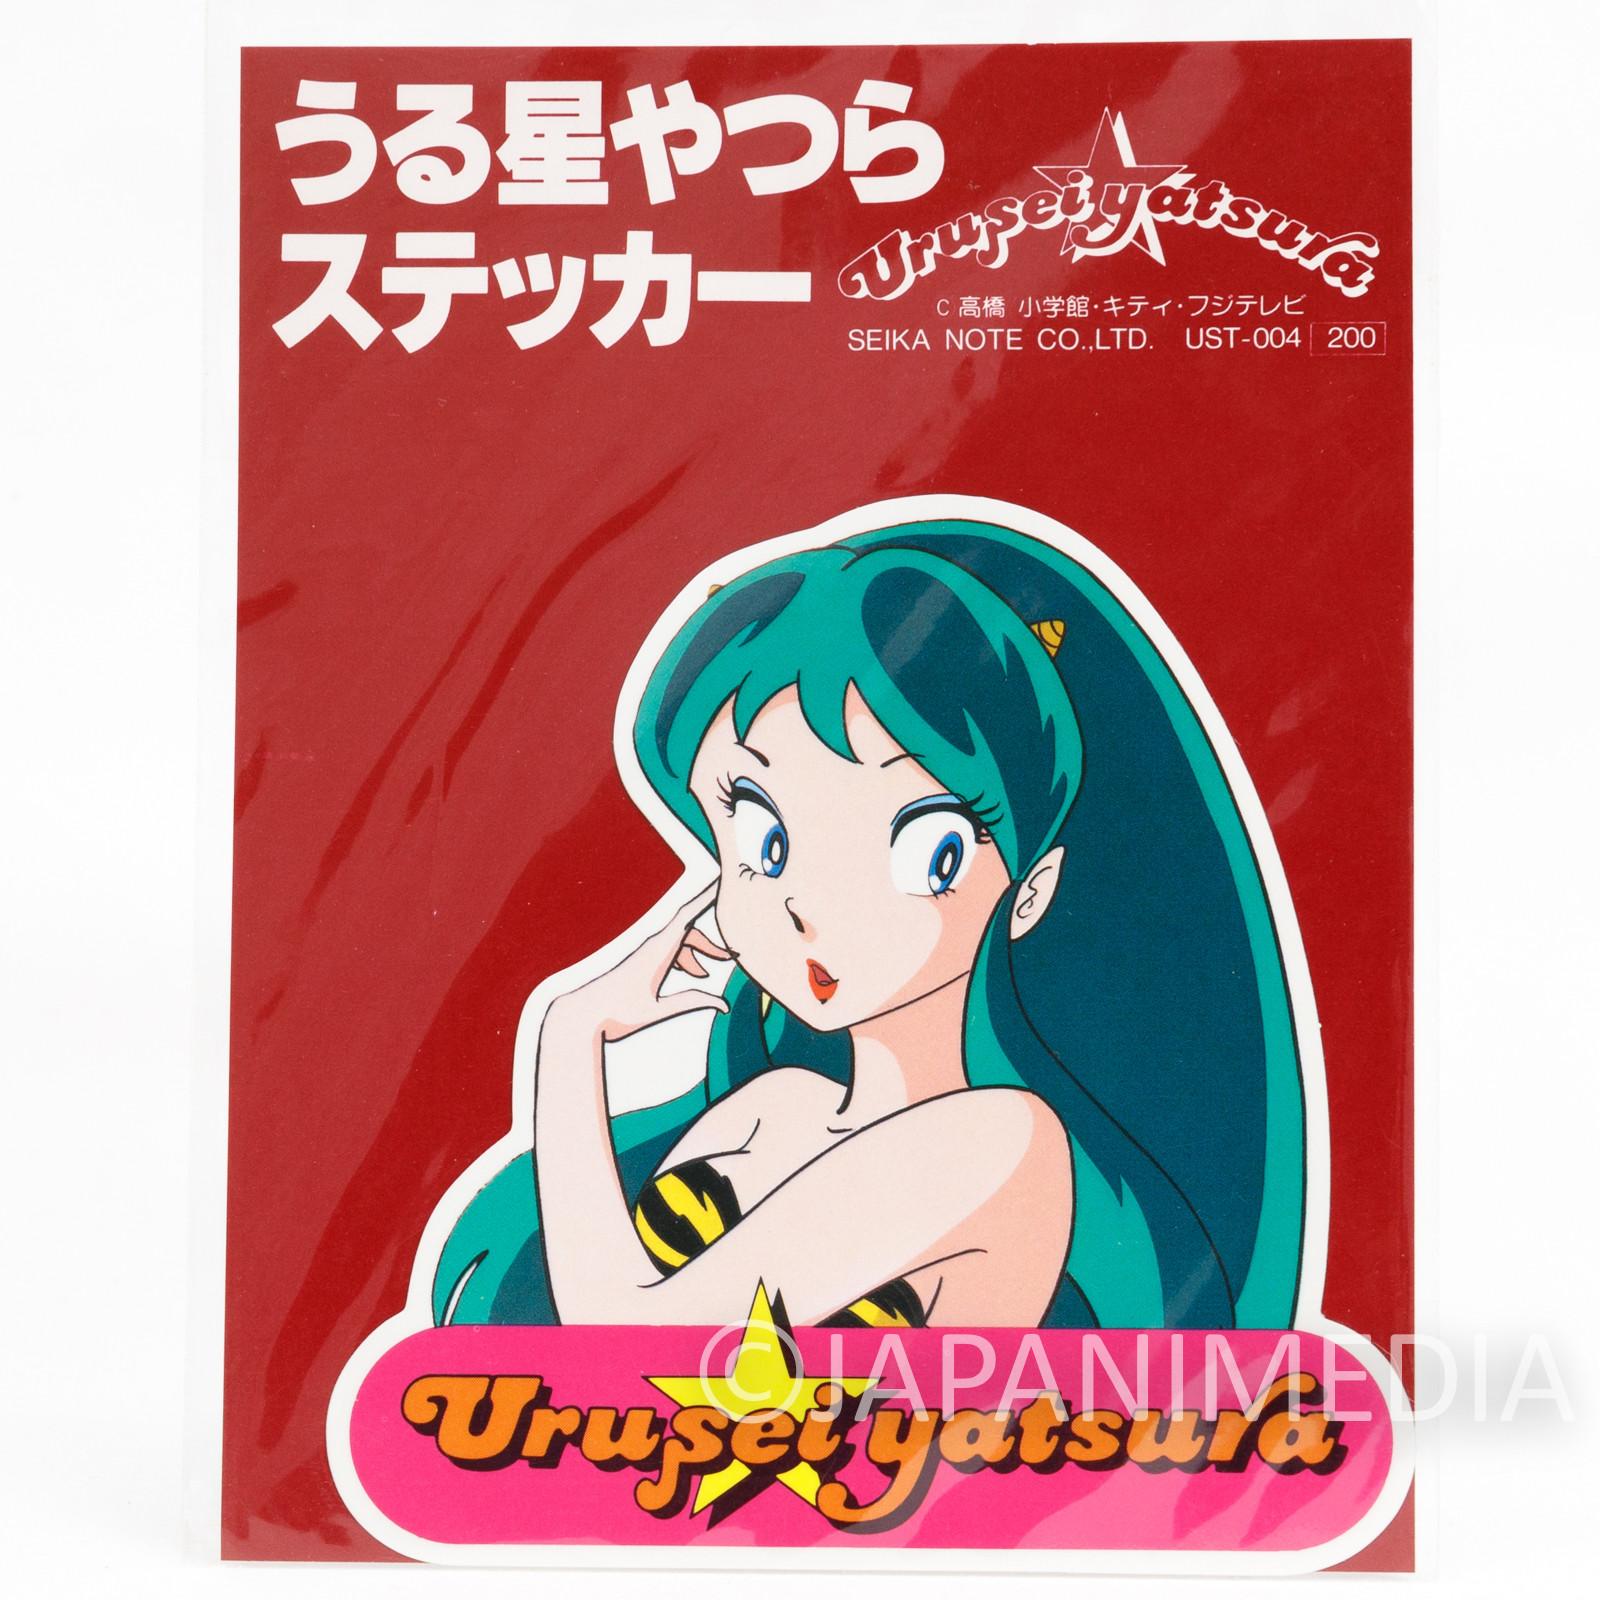 Retro Urusei Yatsura Sticker LUM JAPAN ANIME SEIKA NOTE